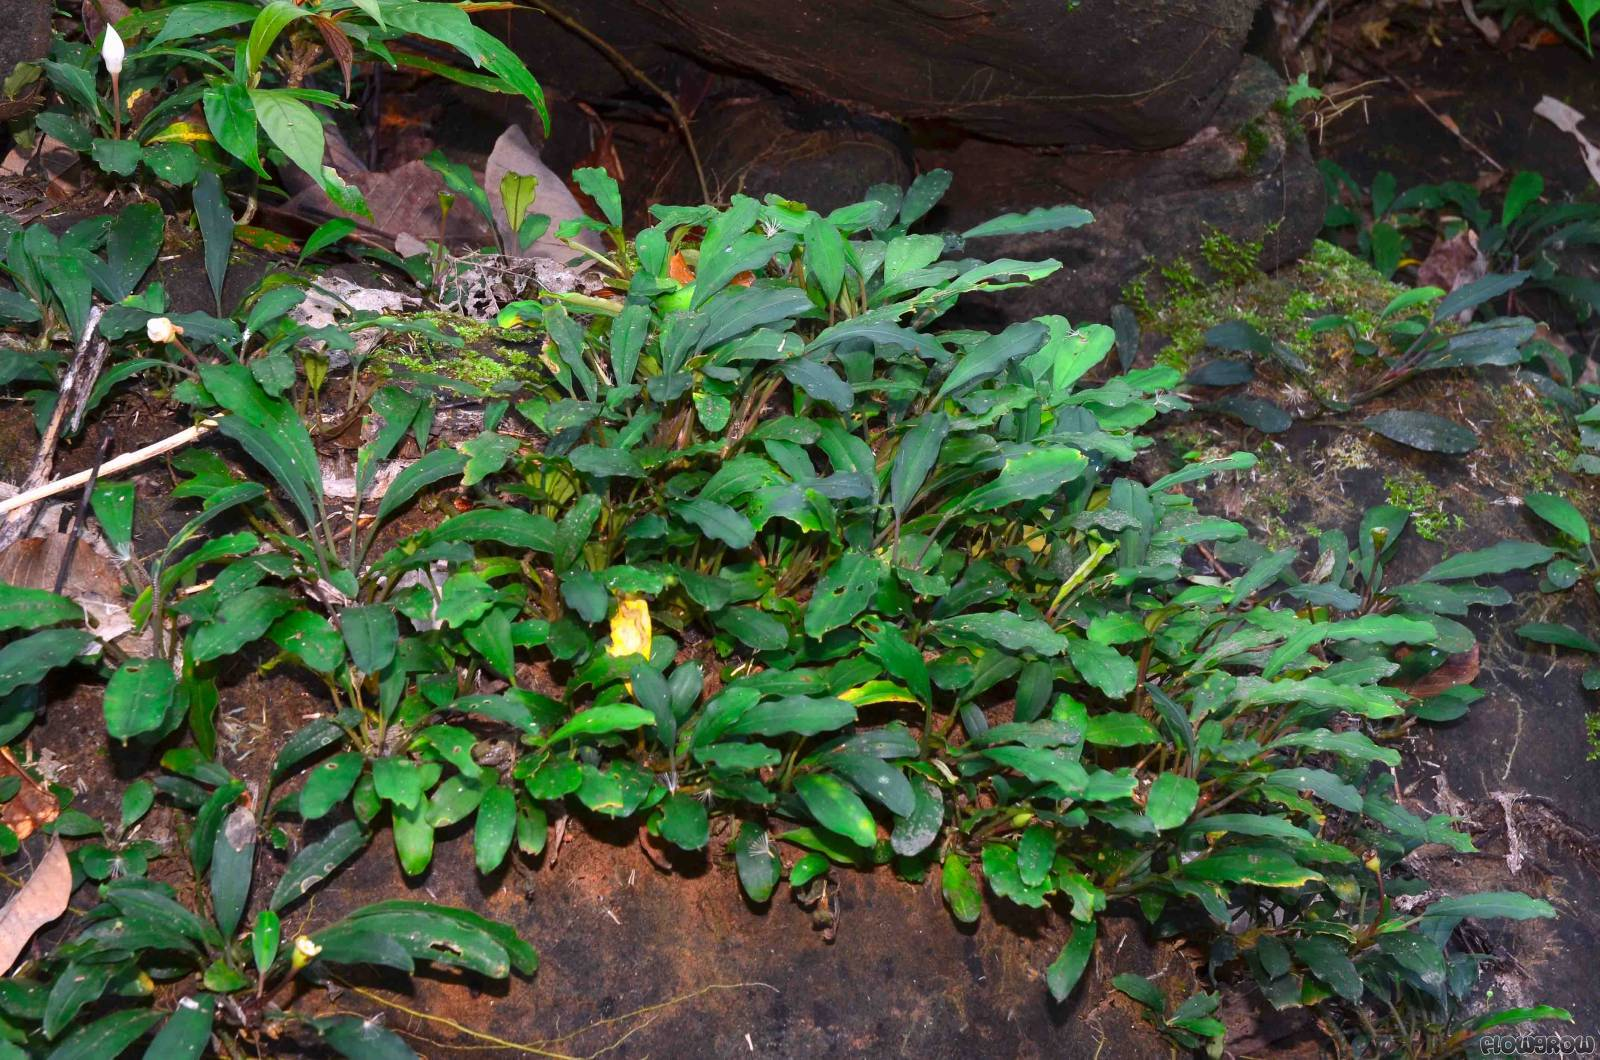 [Share] The Things You Should Know about Bucephalandra Plants bucephalandra motleyana semuntai 516413892f2ae